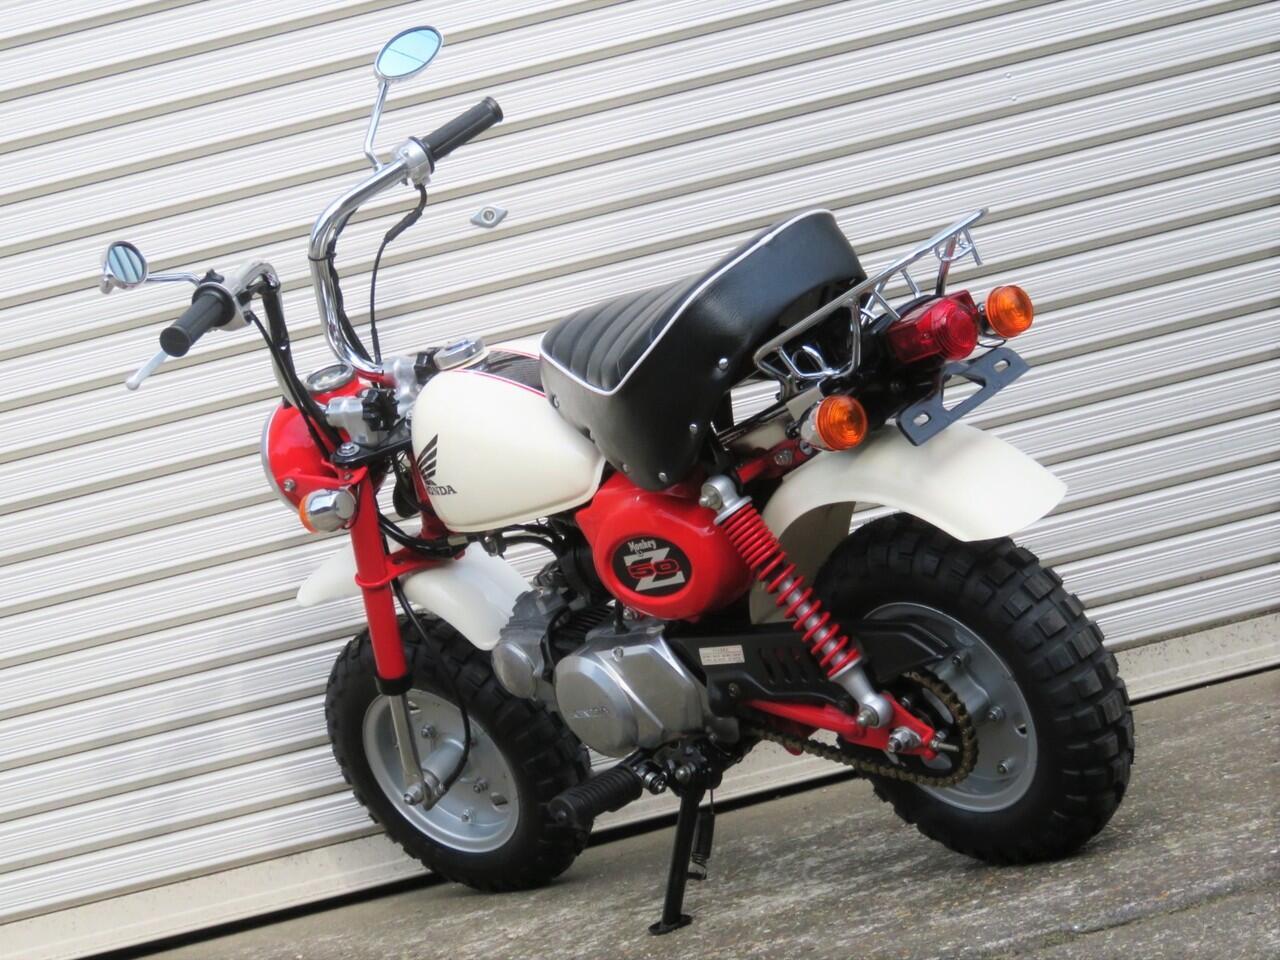 Menyetel Karburator Motor Jadi Irit Speedpartsrus Kaskus